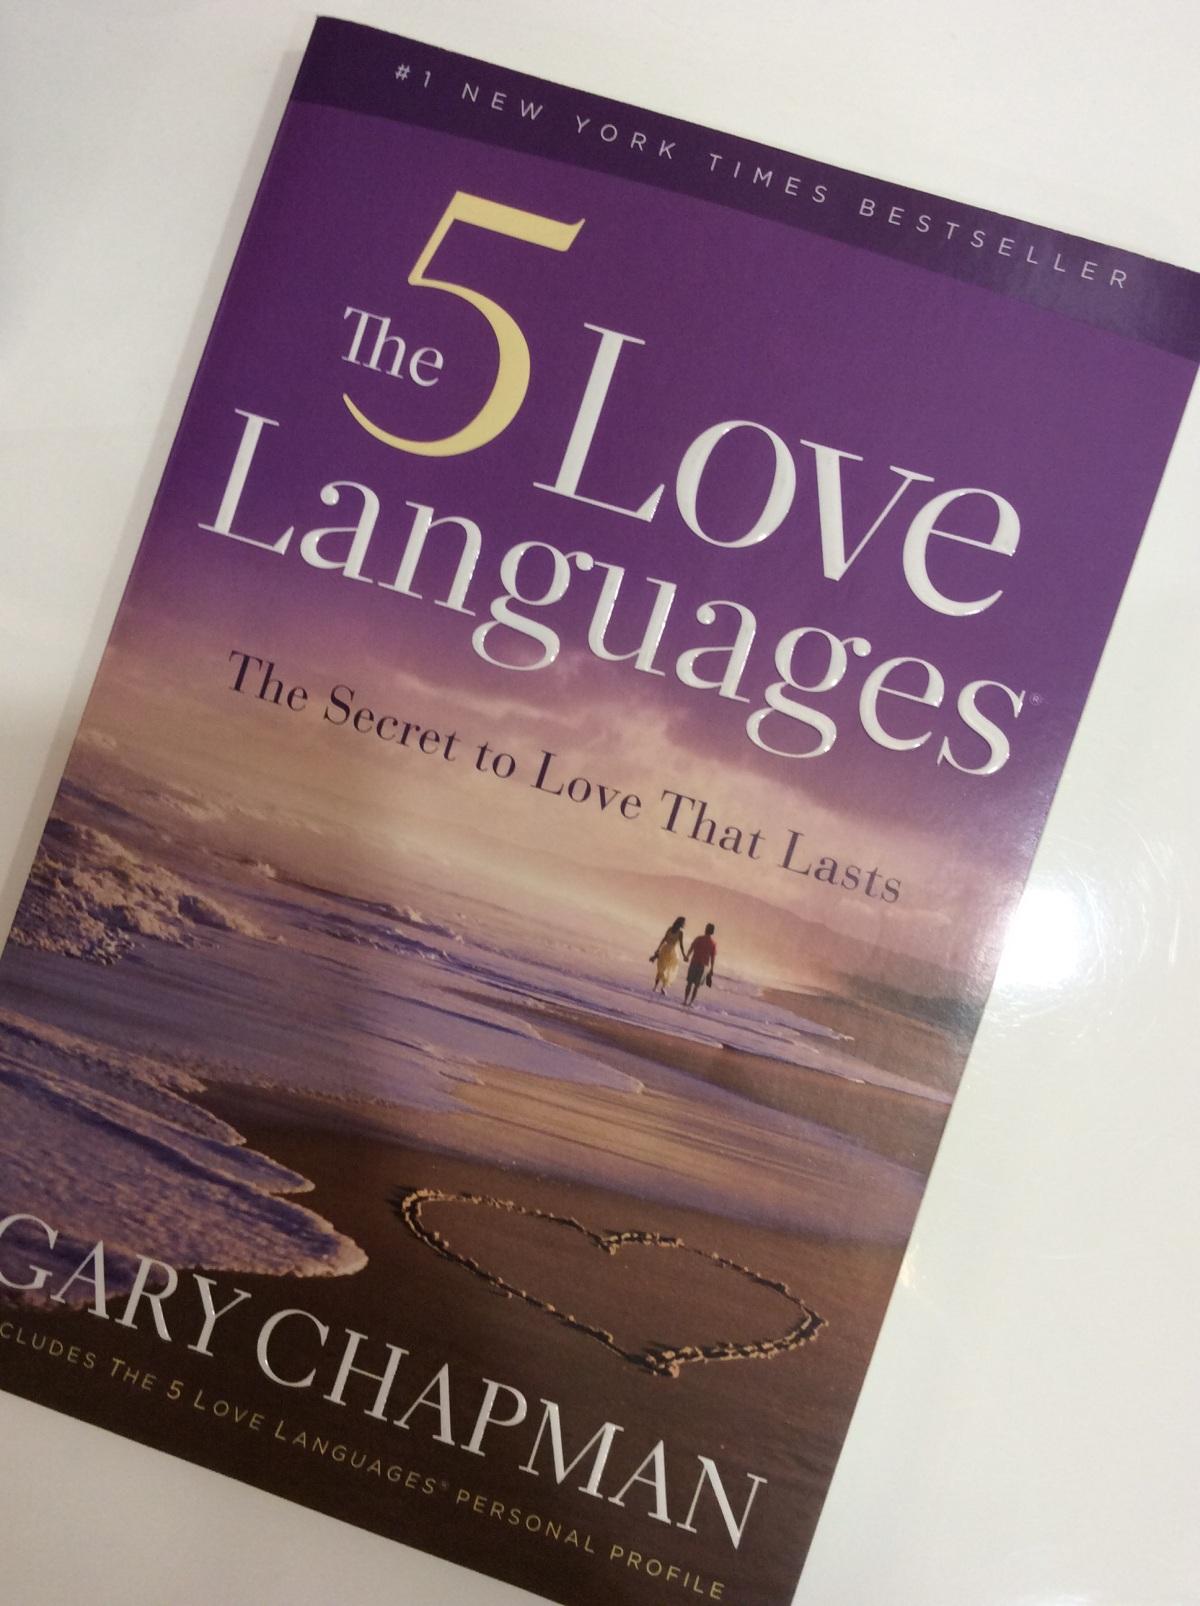 The 5 Love Languages – Dr. GaryChapman's